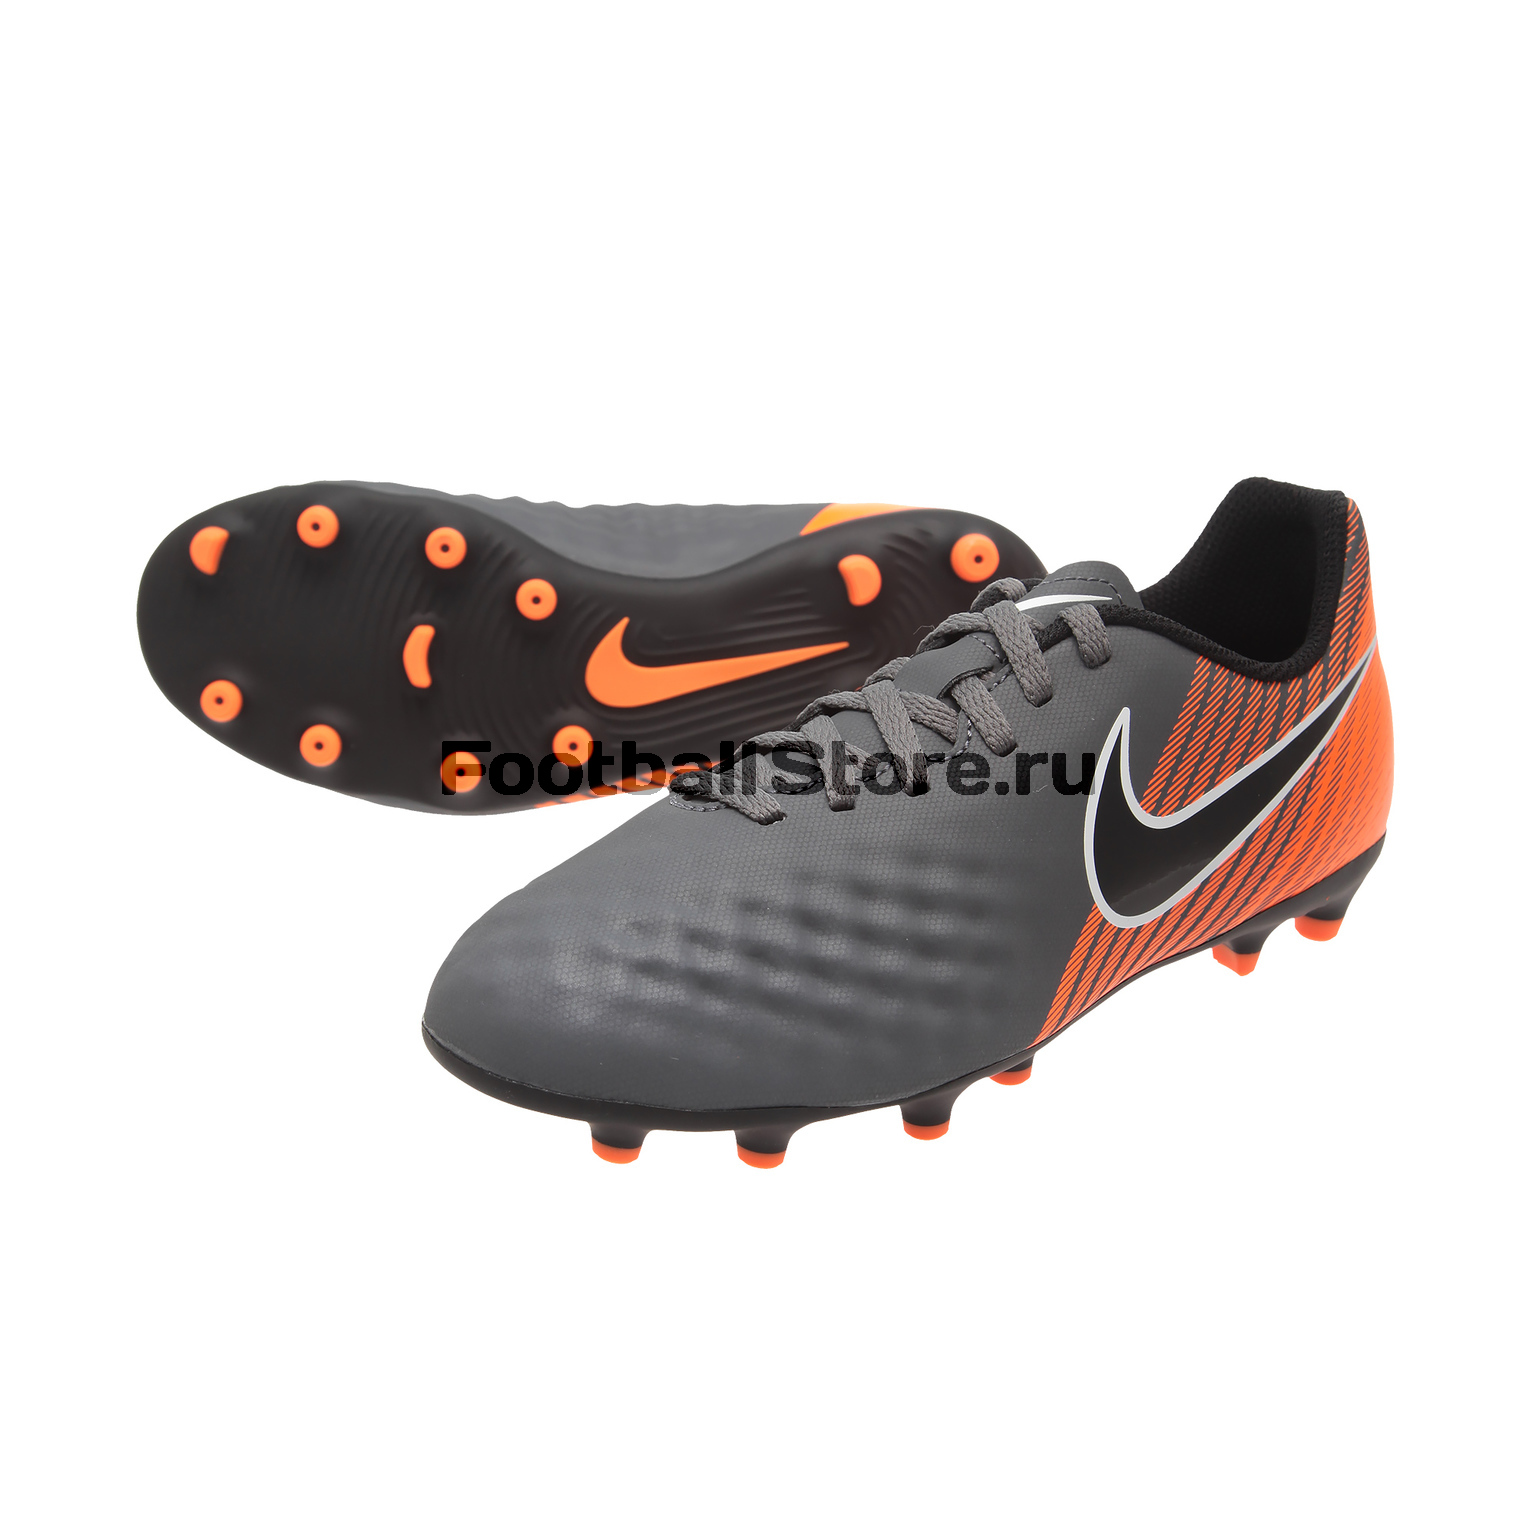 Бутсы Nike JR Obra 2 Club FG AH7314-080 бутсы nike jr superfly 6 club fg mg ah7339 081